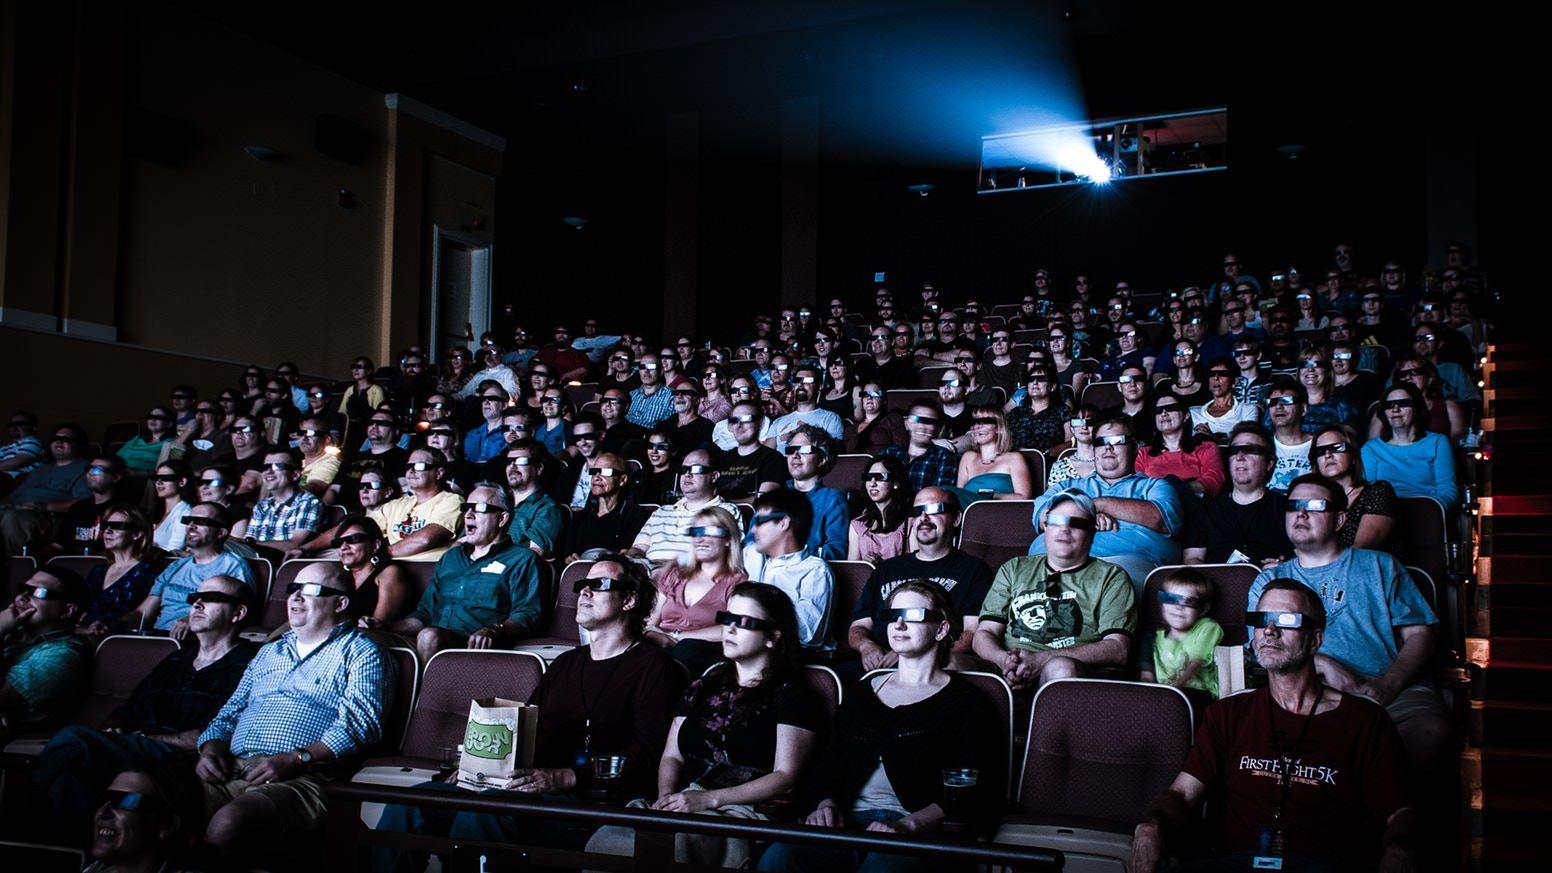 Will cinemas go out of business cinemas future